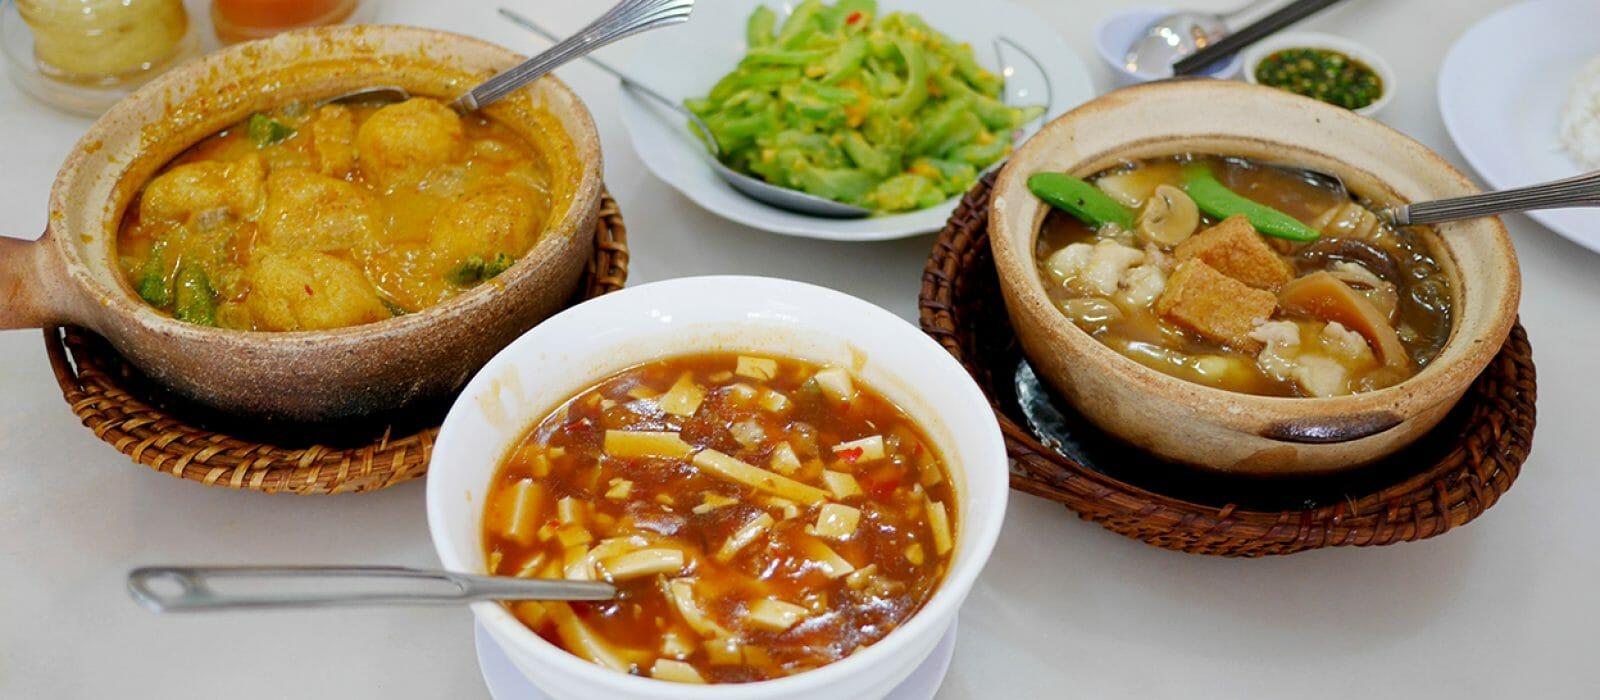 Sam U Claypot Restaurant, PJ State